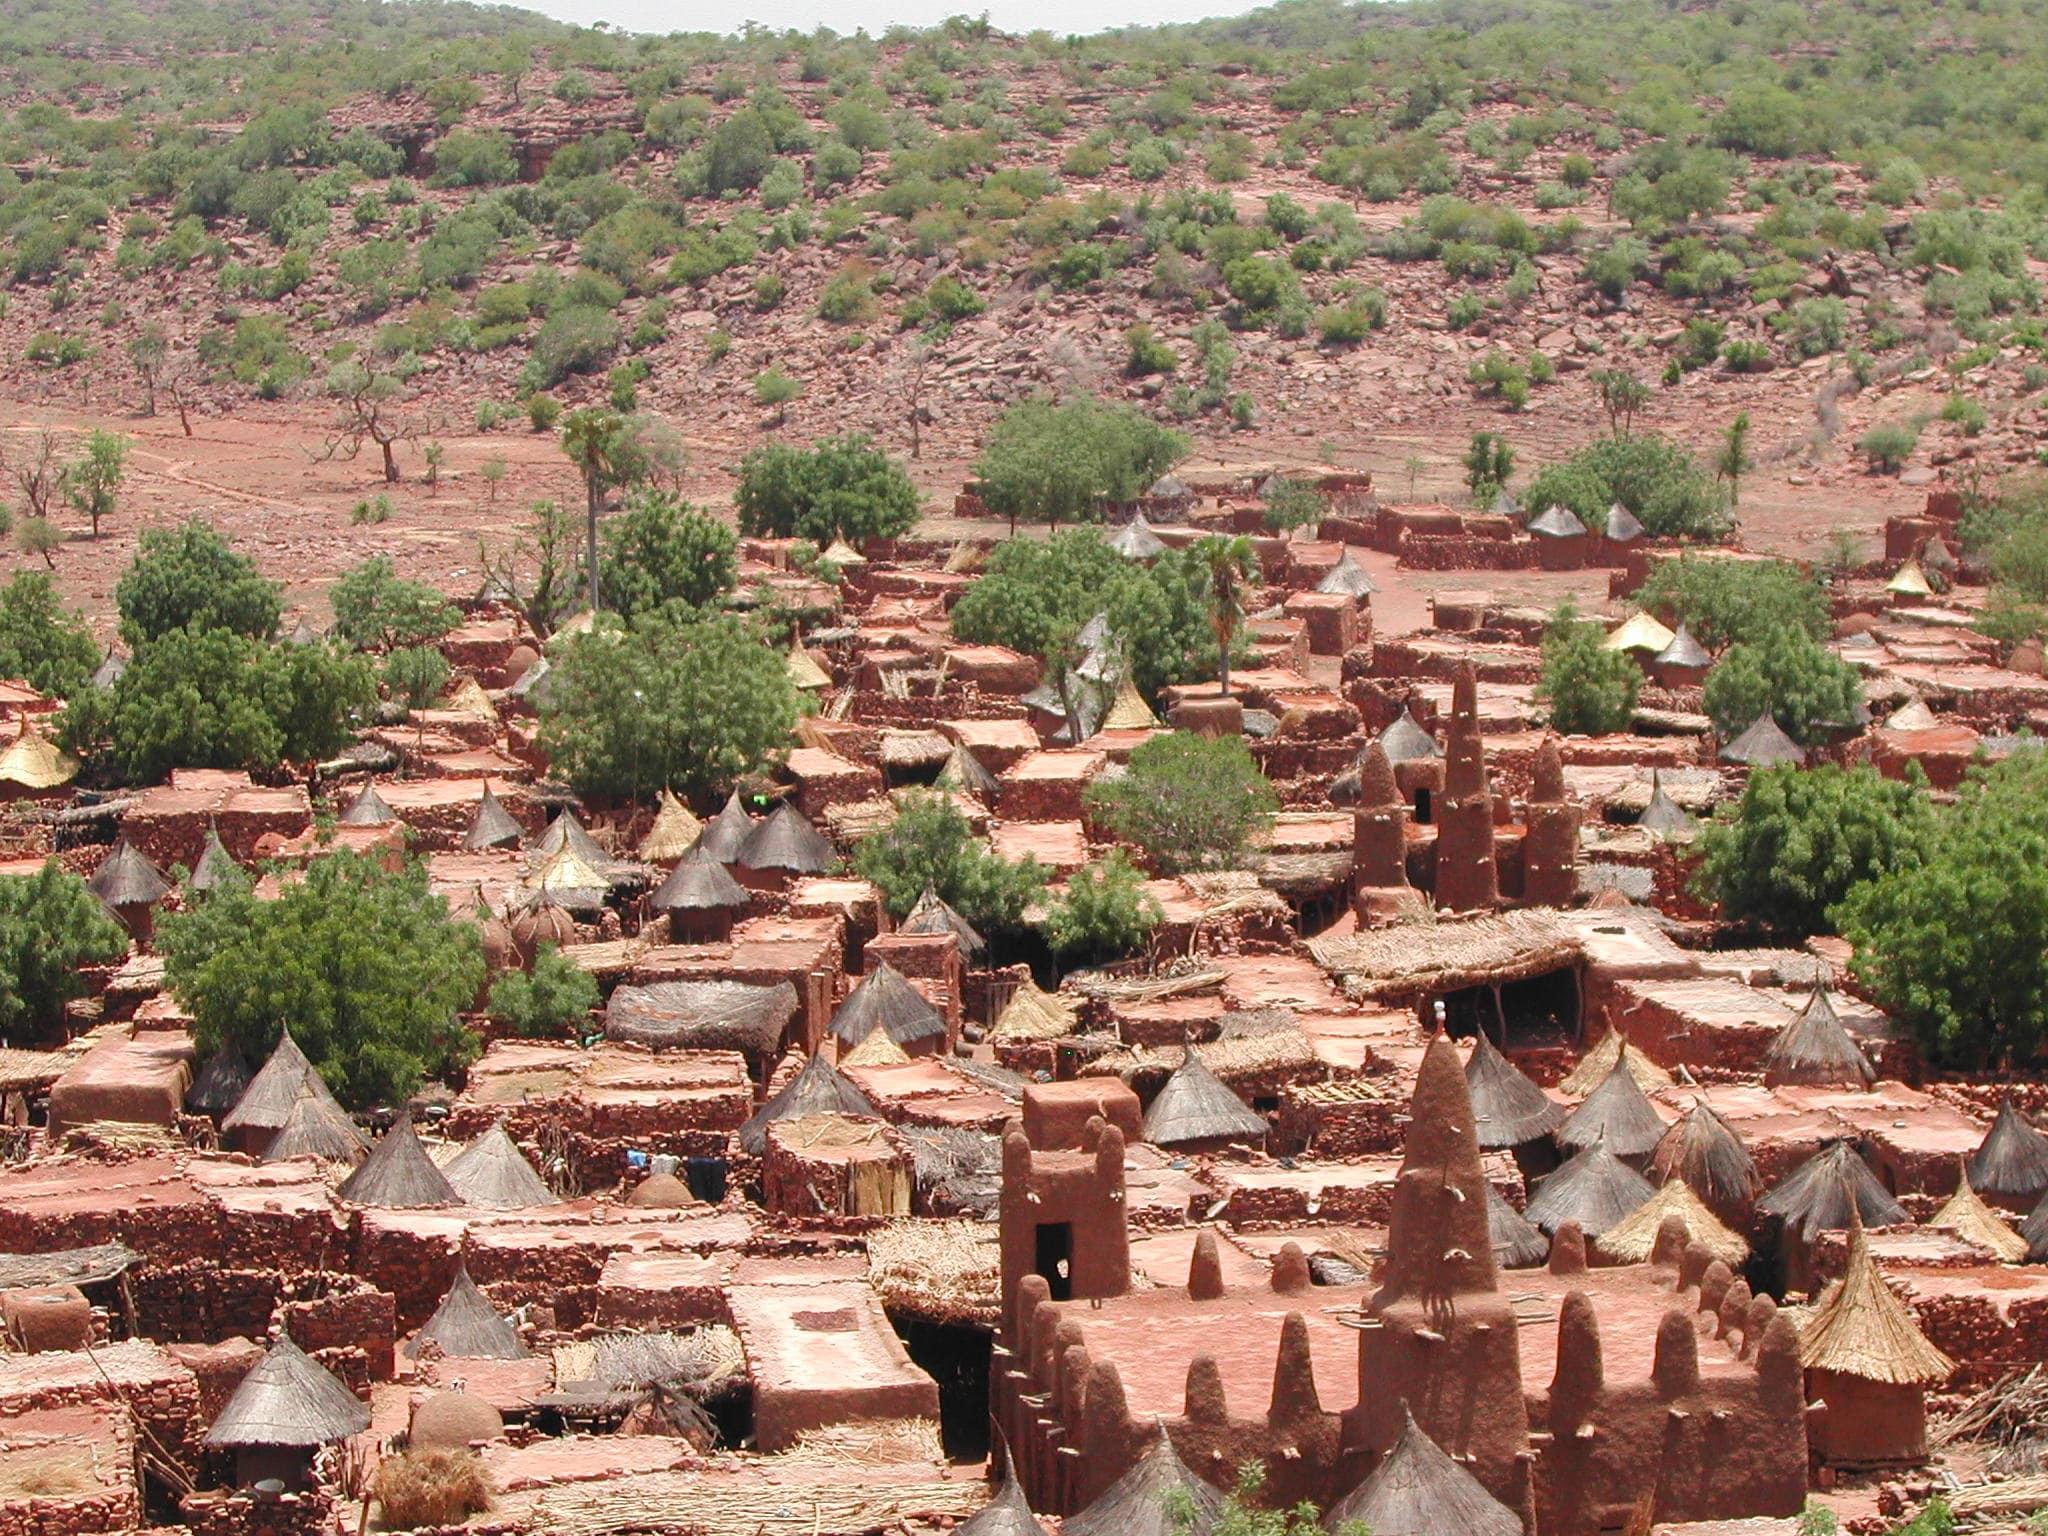 Village of Gani